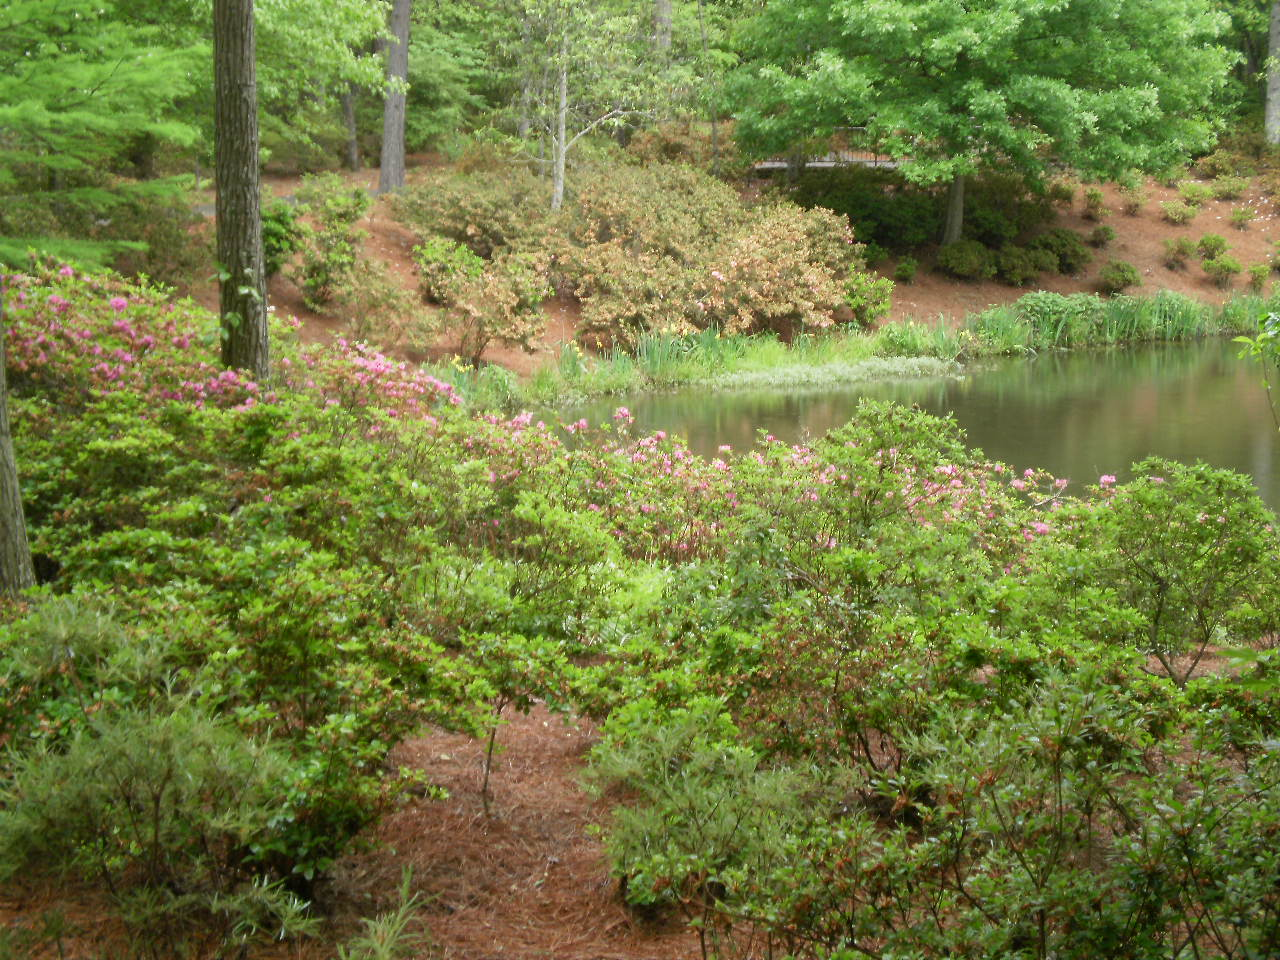 Ramblertrek callaway gardens pine mountain georgia - Callaway gardens pine mountain georgia ...